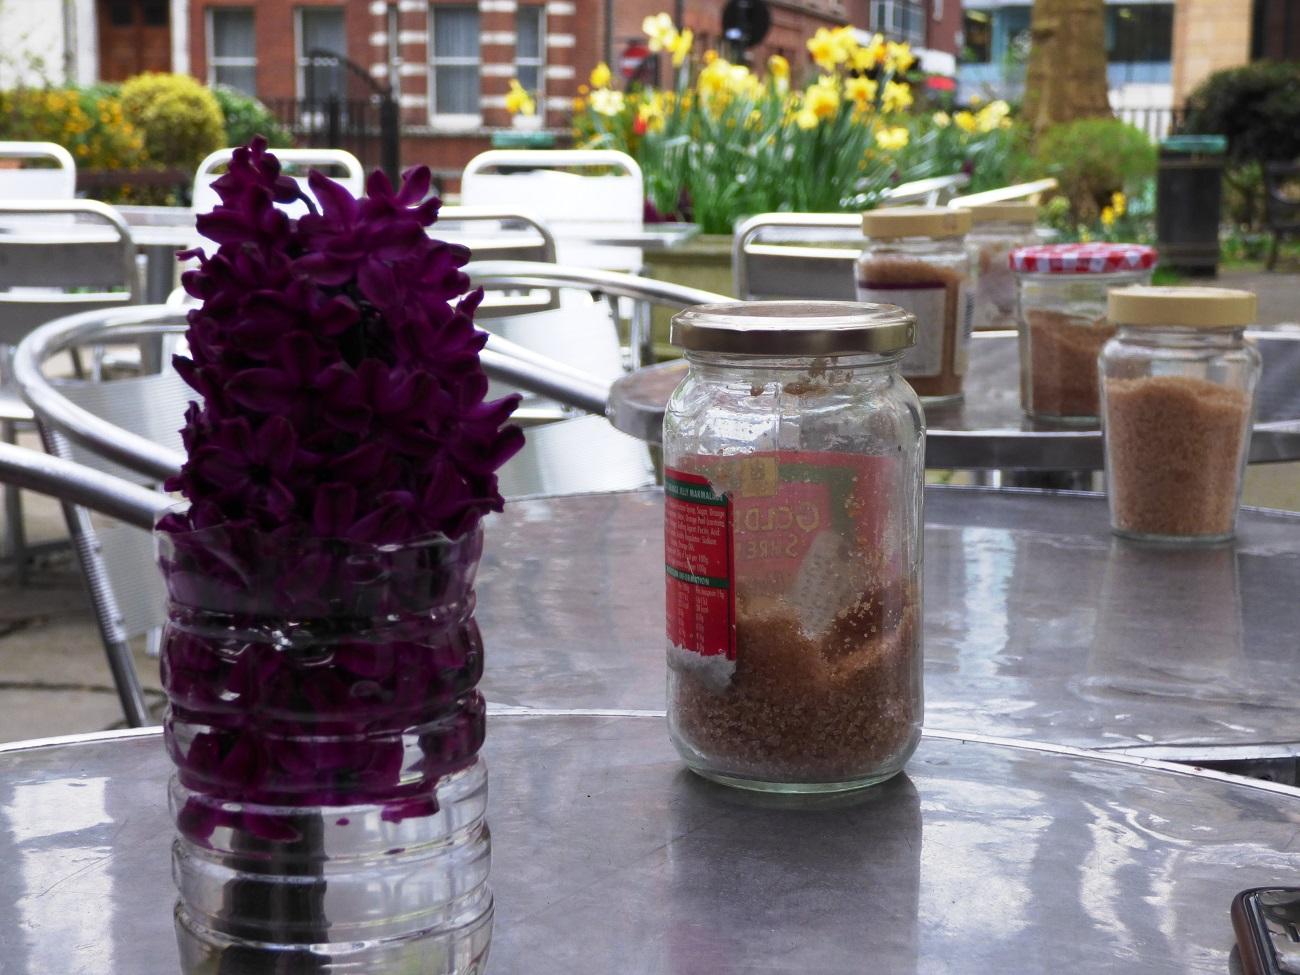 20170323_Camden_Red-Lion-Square-Gardens_Cafe-view